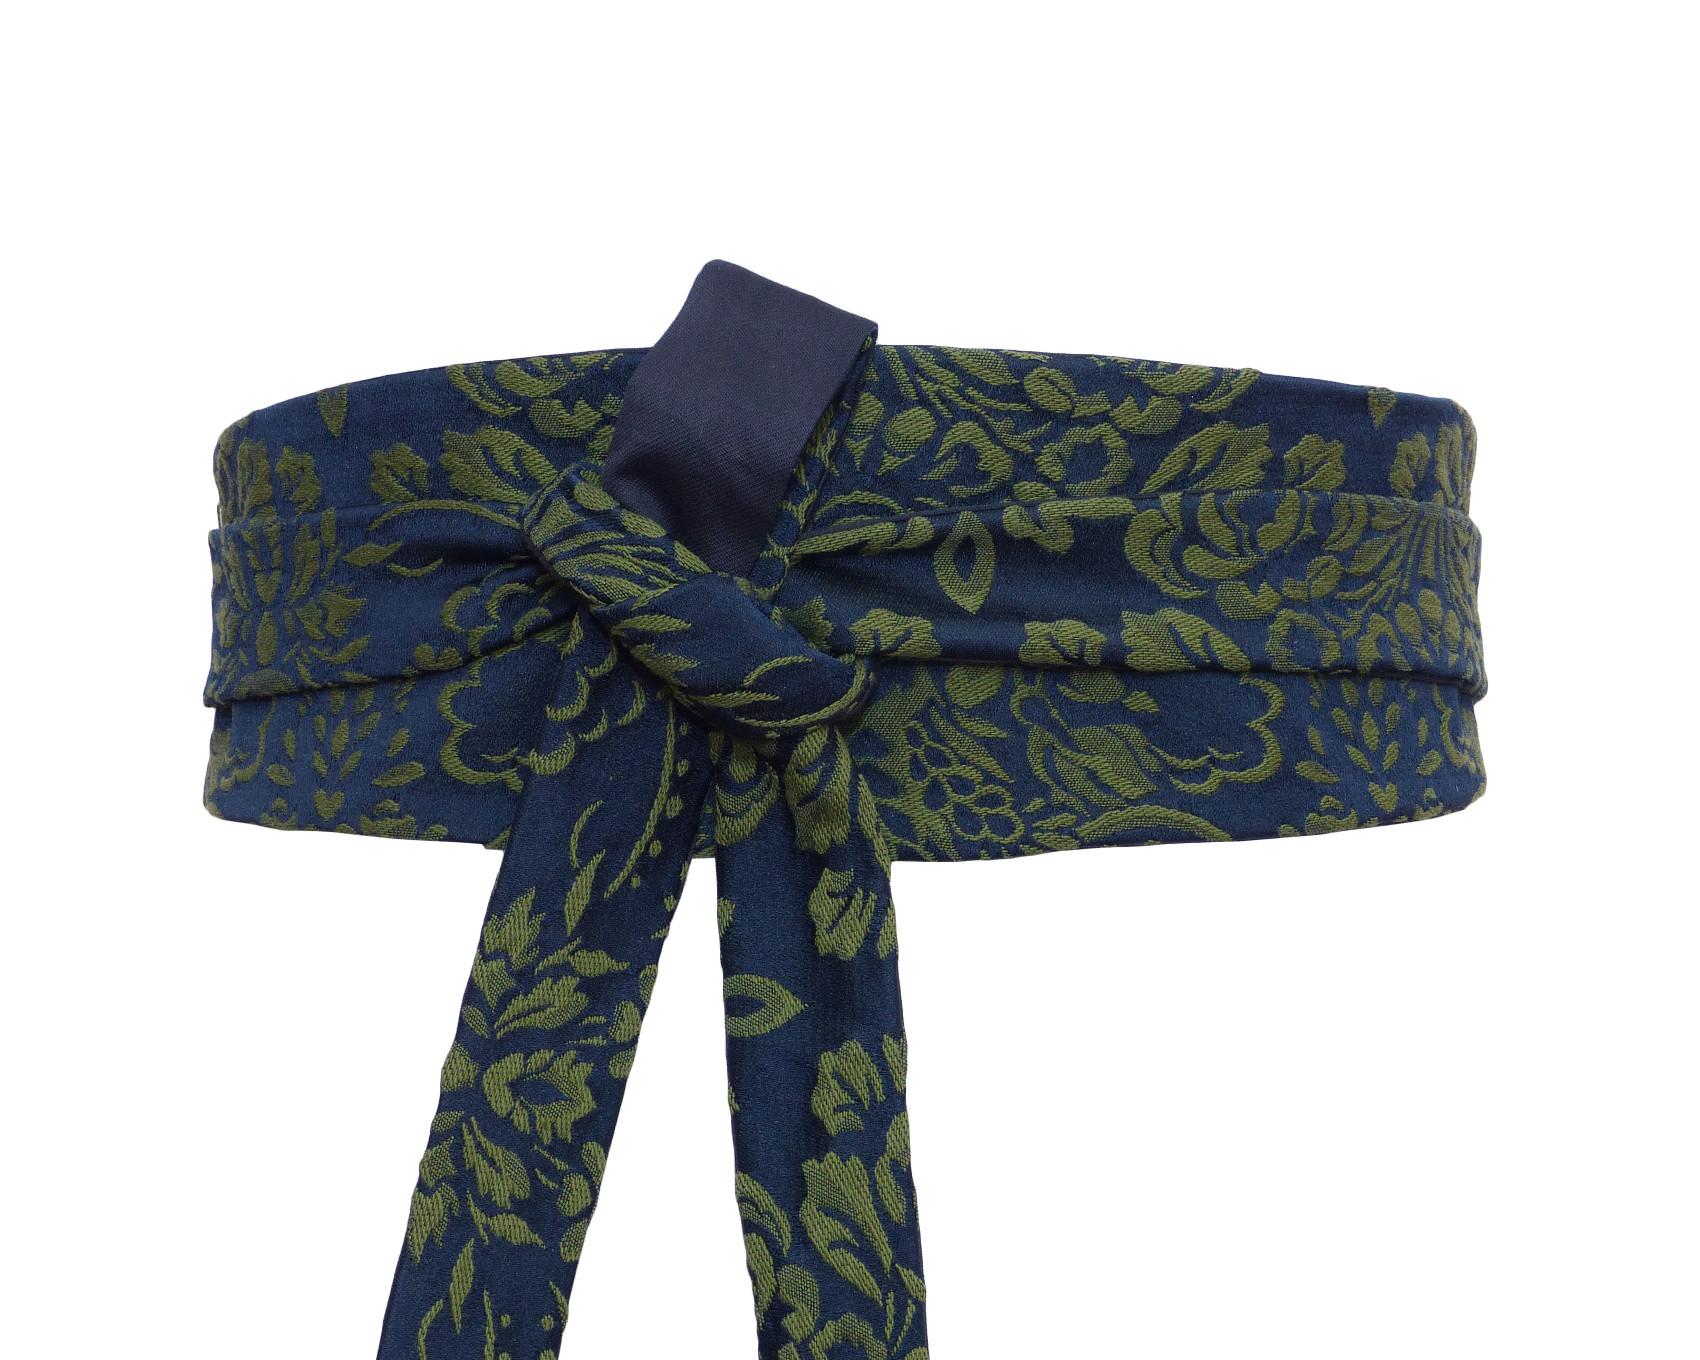 737e1e846f0 Ceinture obi en brocart de soie vert olive et bleu marine